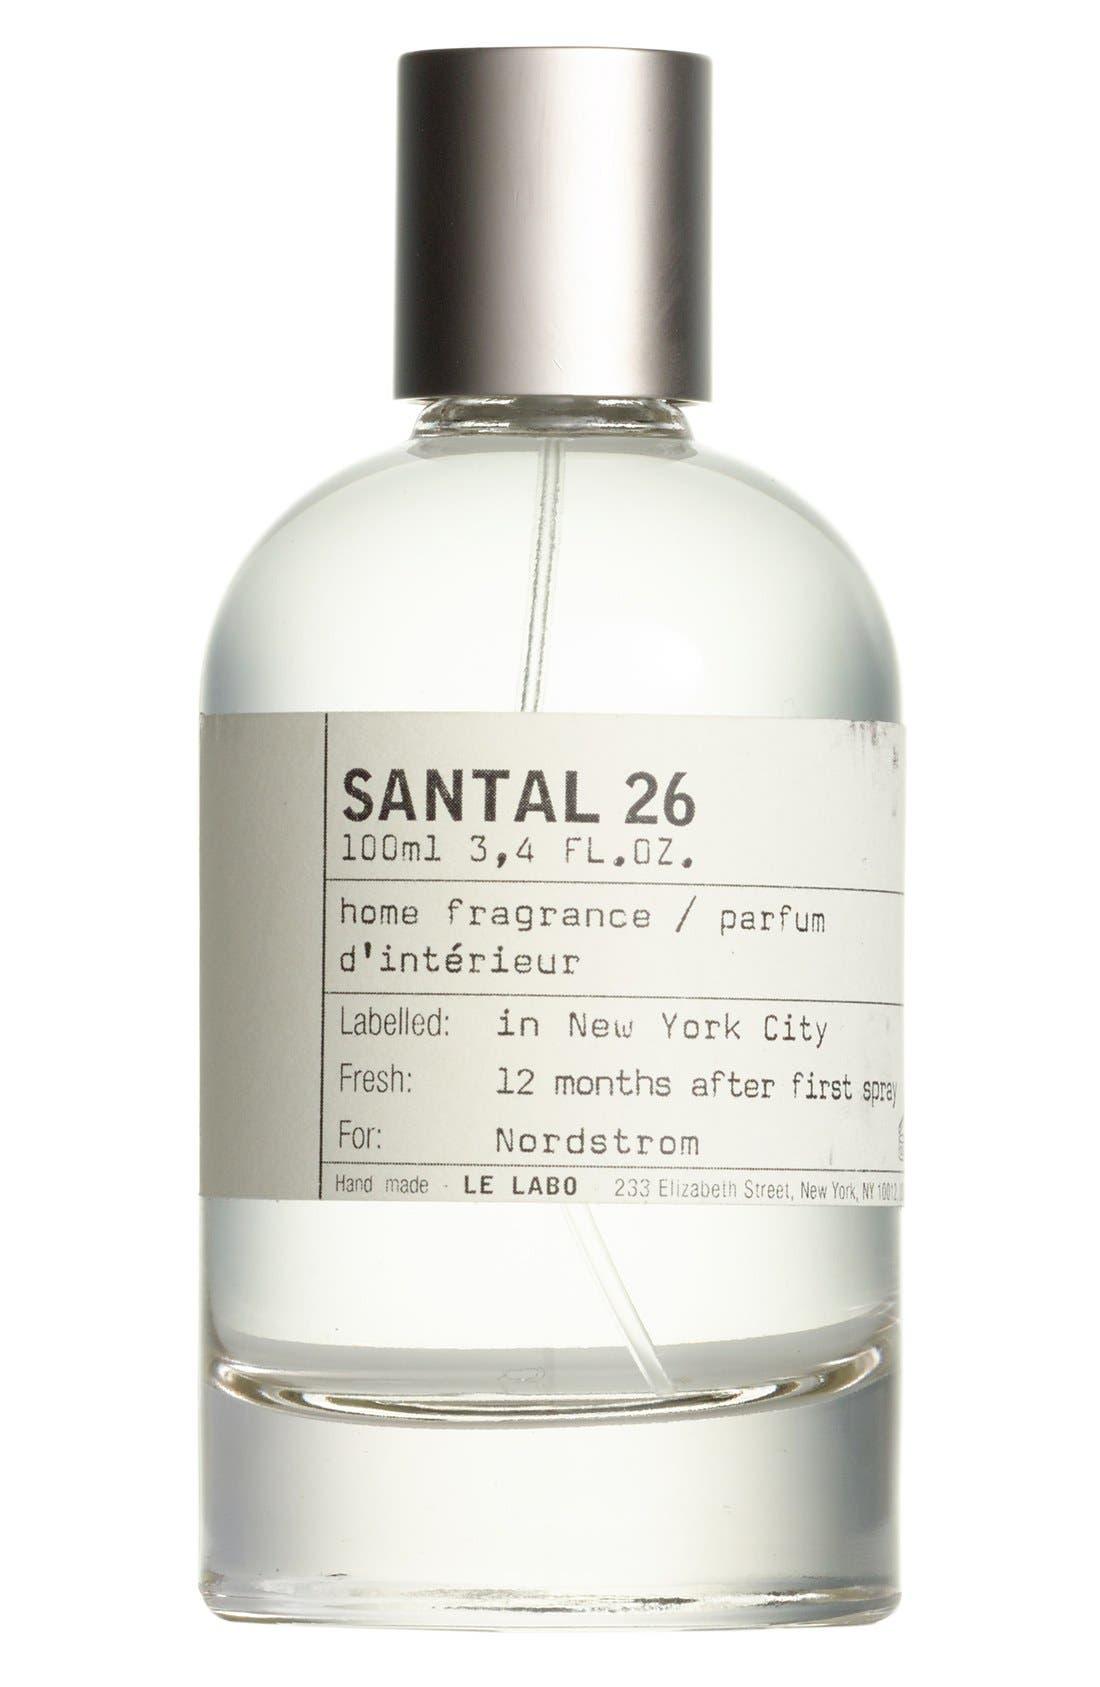 Le Labo 'Santal 26' Home Fragrance Spray